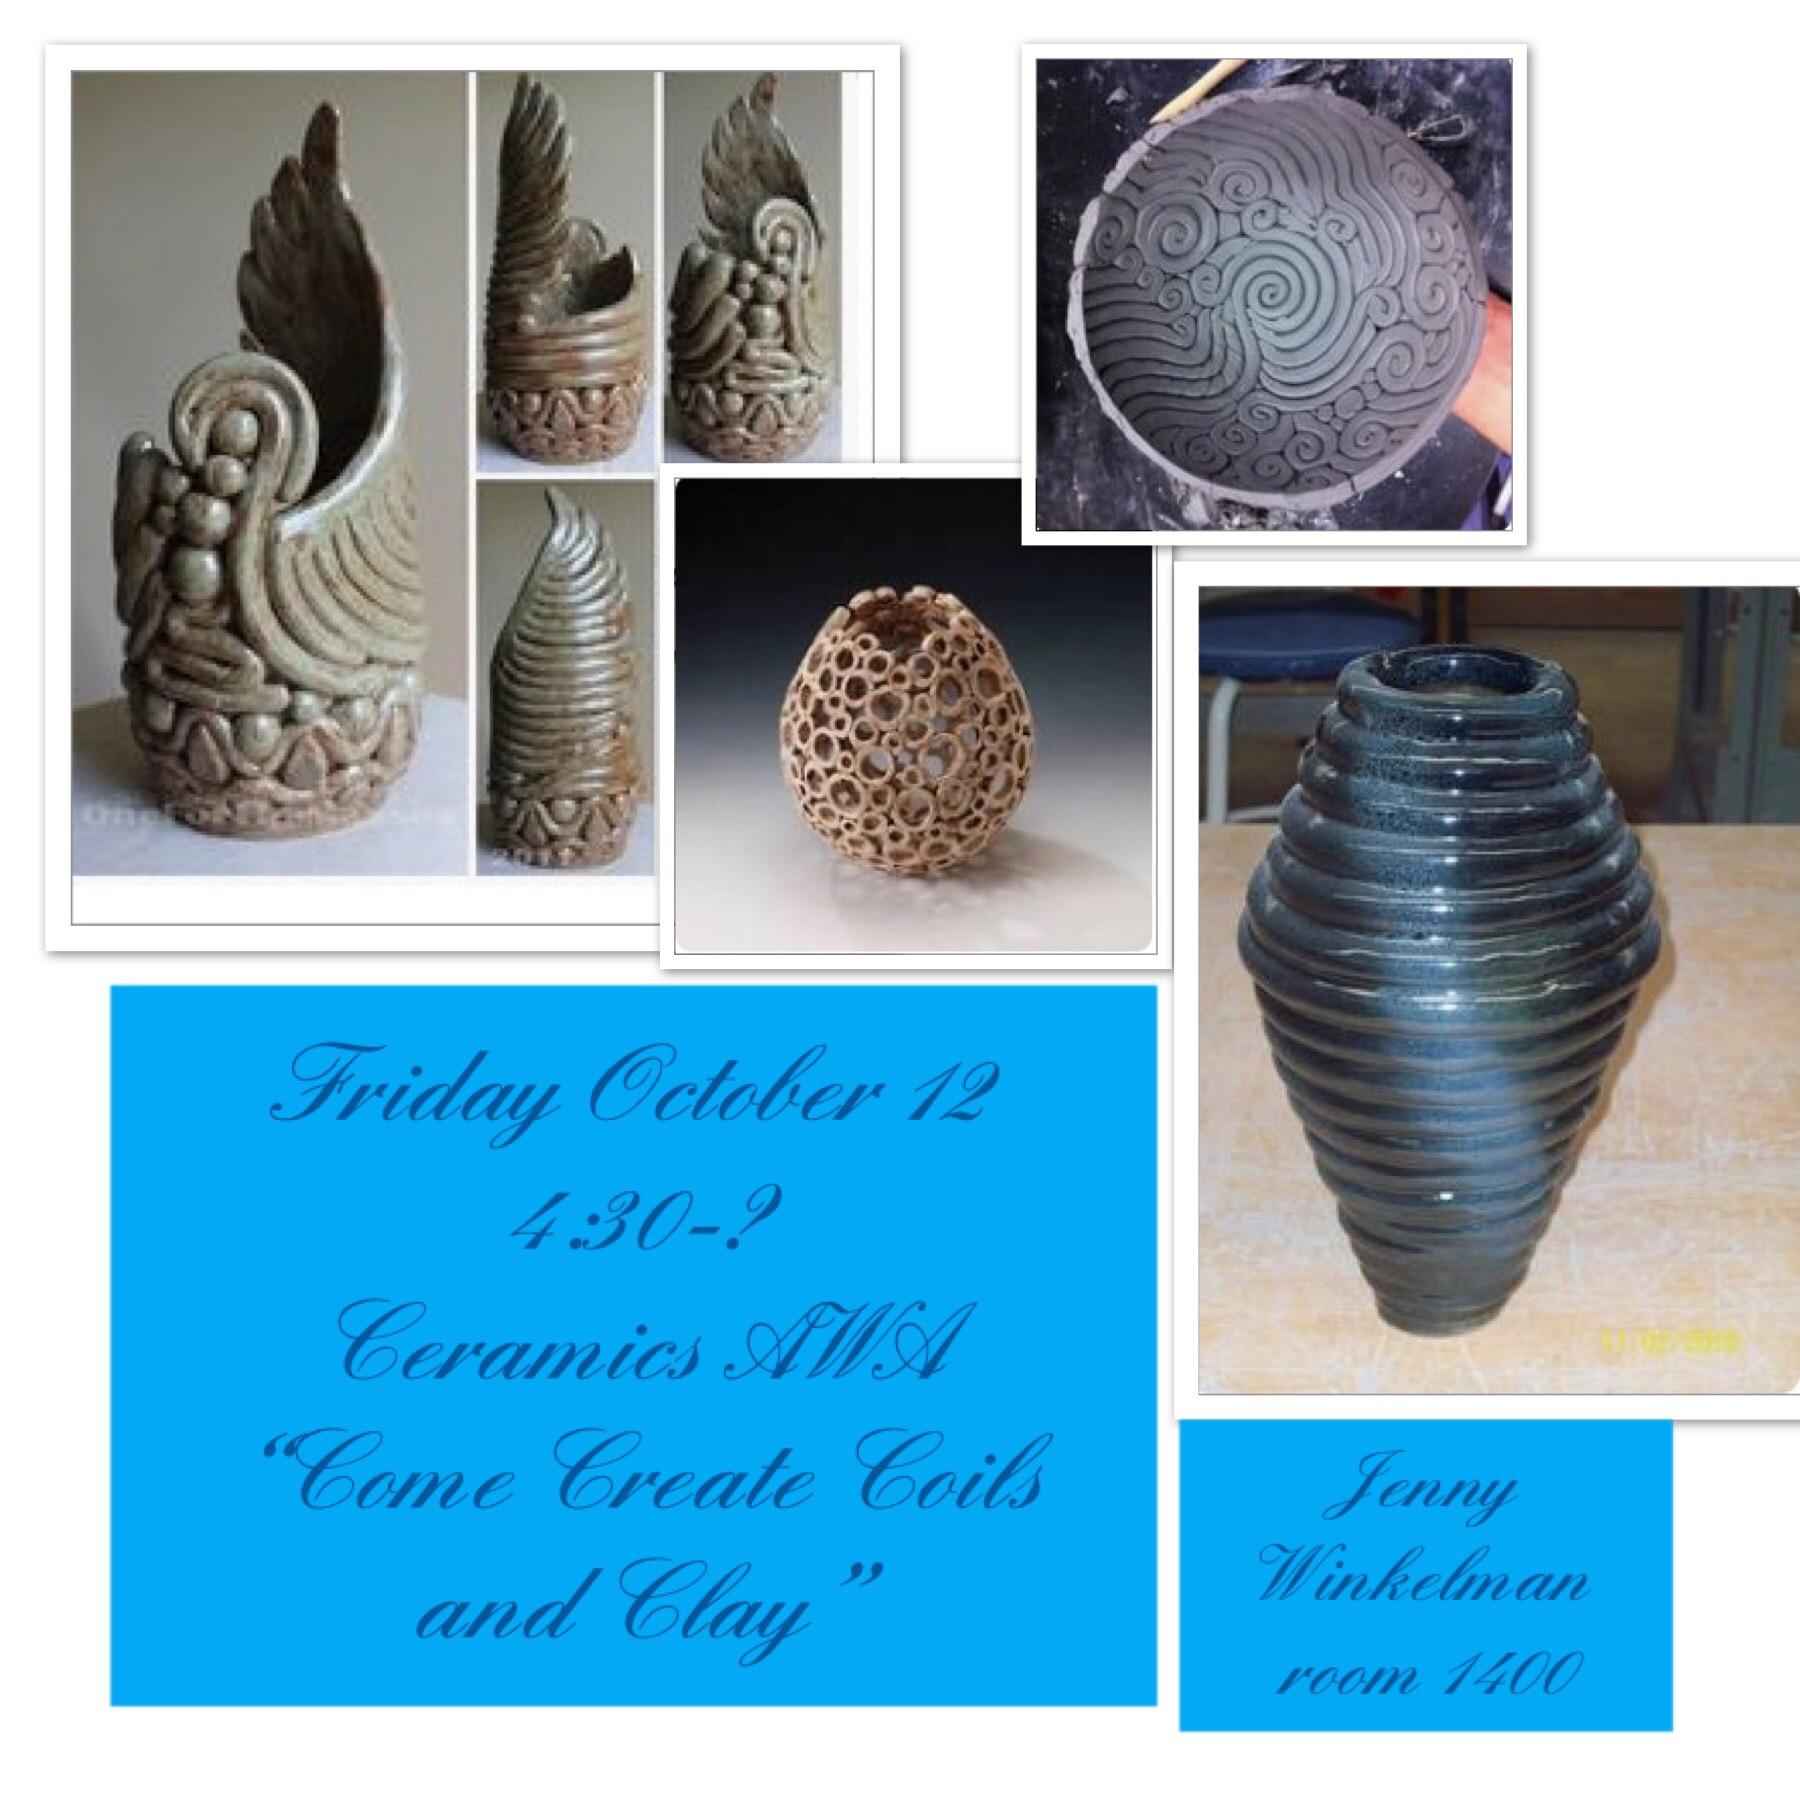 AWA Event Ceramics Oct 12.JPG